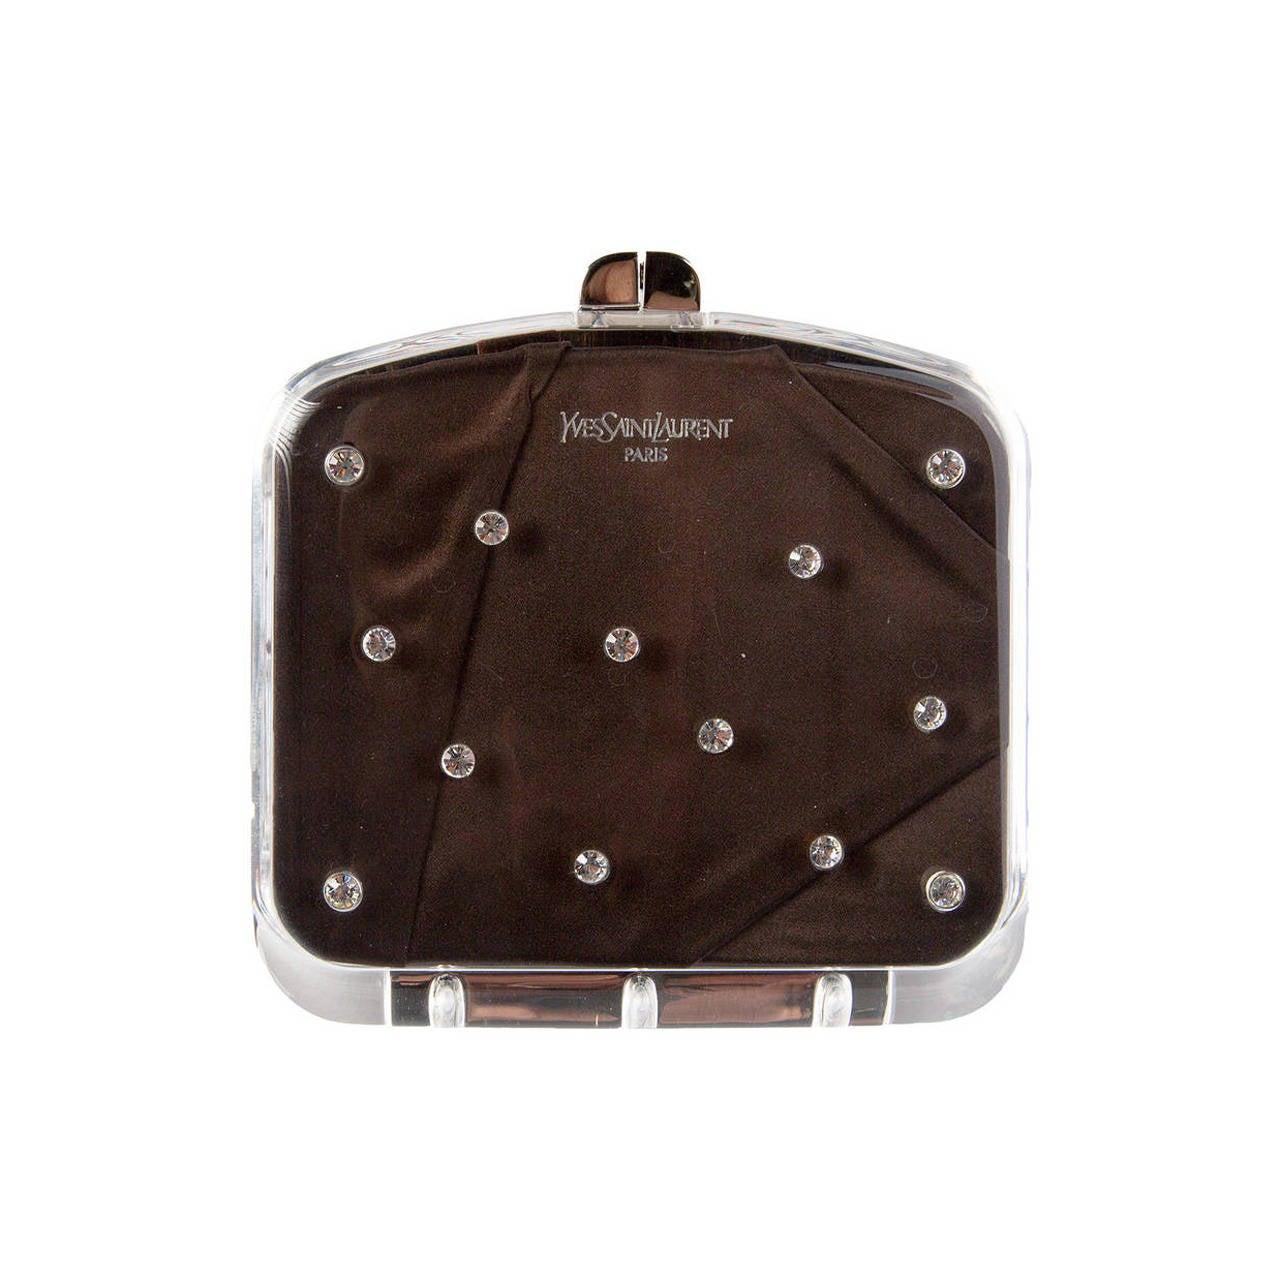 Basha Gold Handbags and Purses - Boca Raton, FL 33487 - 1stdibs